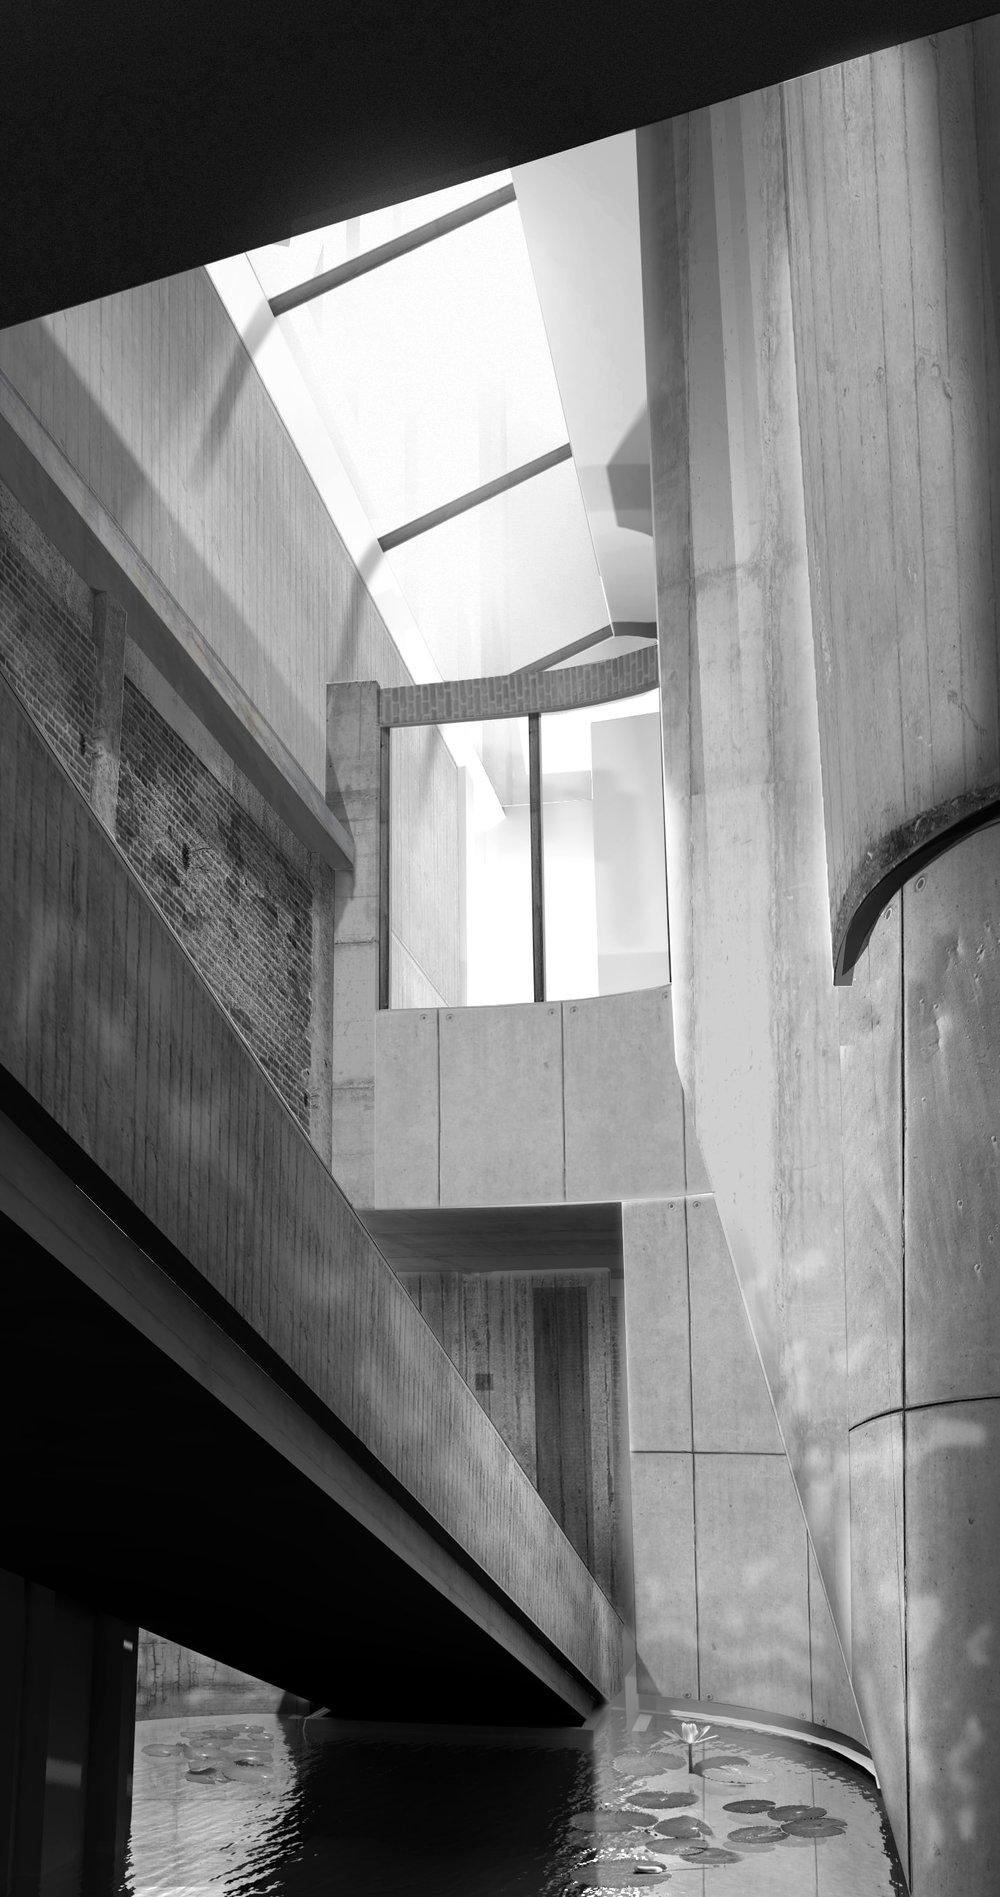 sound-pavilion-detail-render-3-1-min.jpg